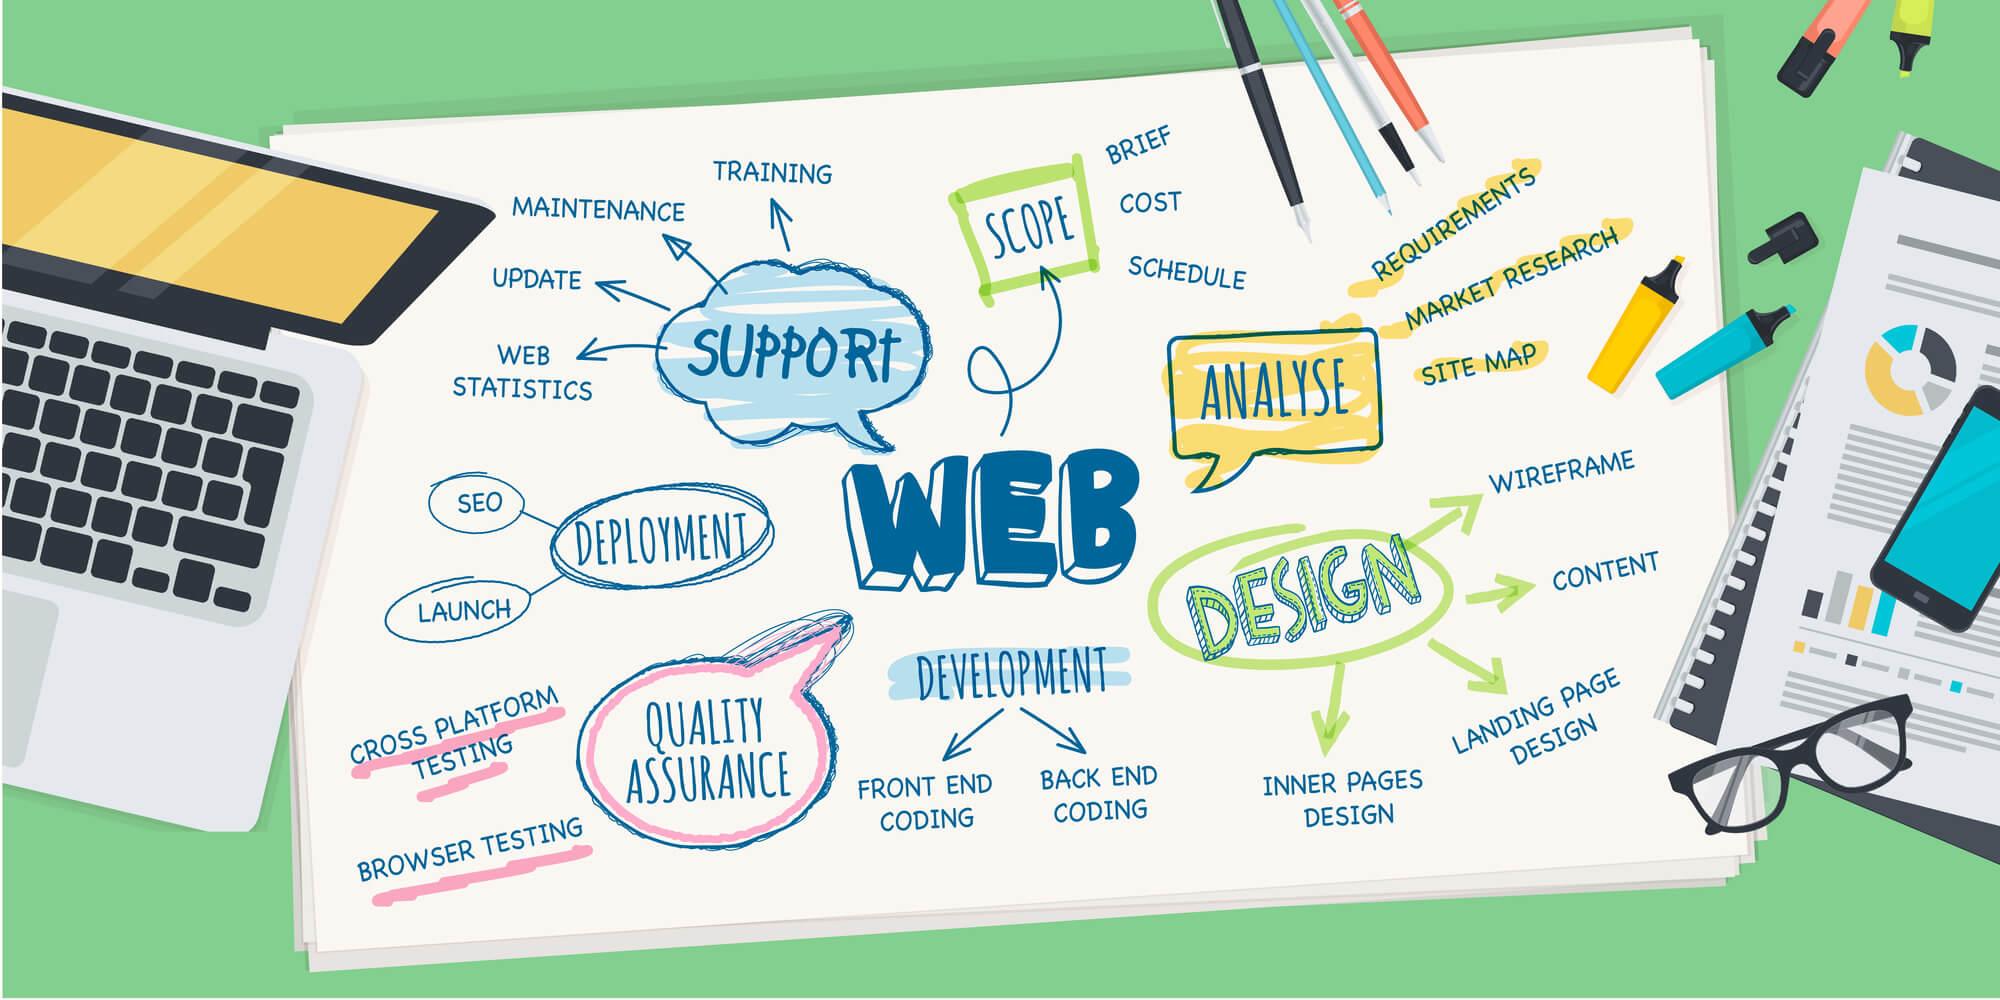 Website Planning and Creation,digital marketing institute,digital marketing institute in gurgaon,digital marketing course in gurgaon